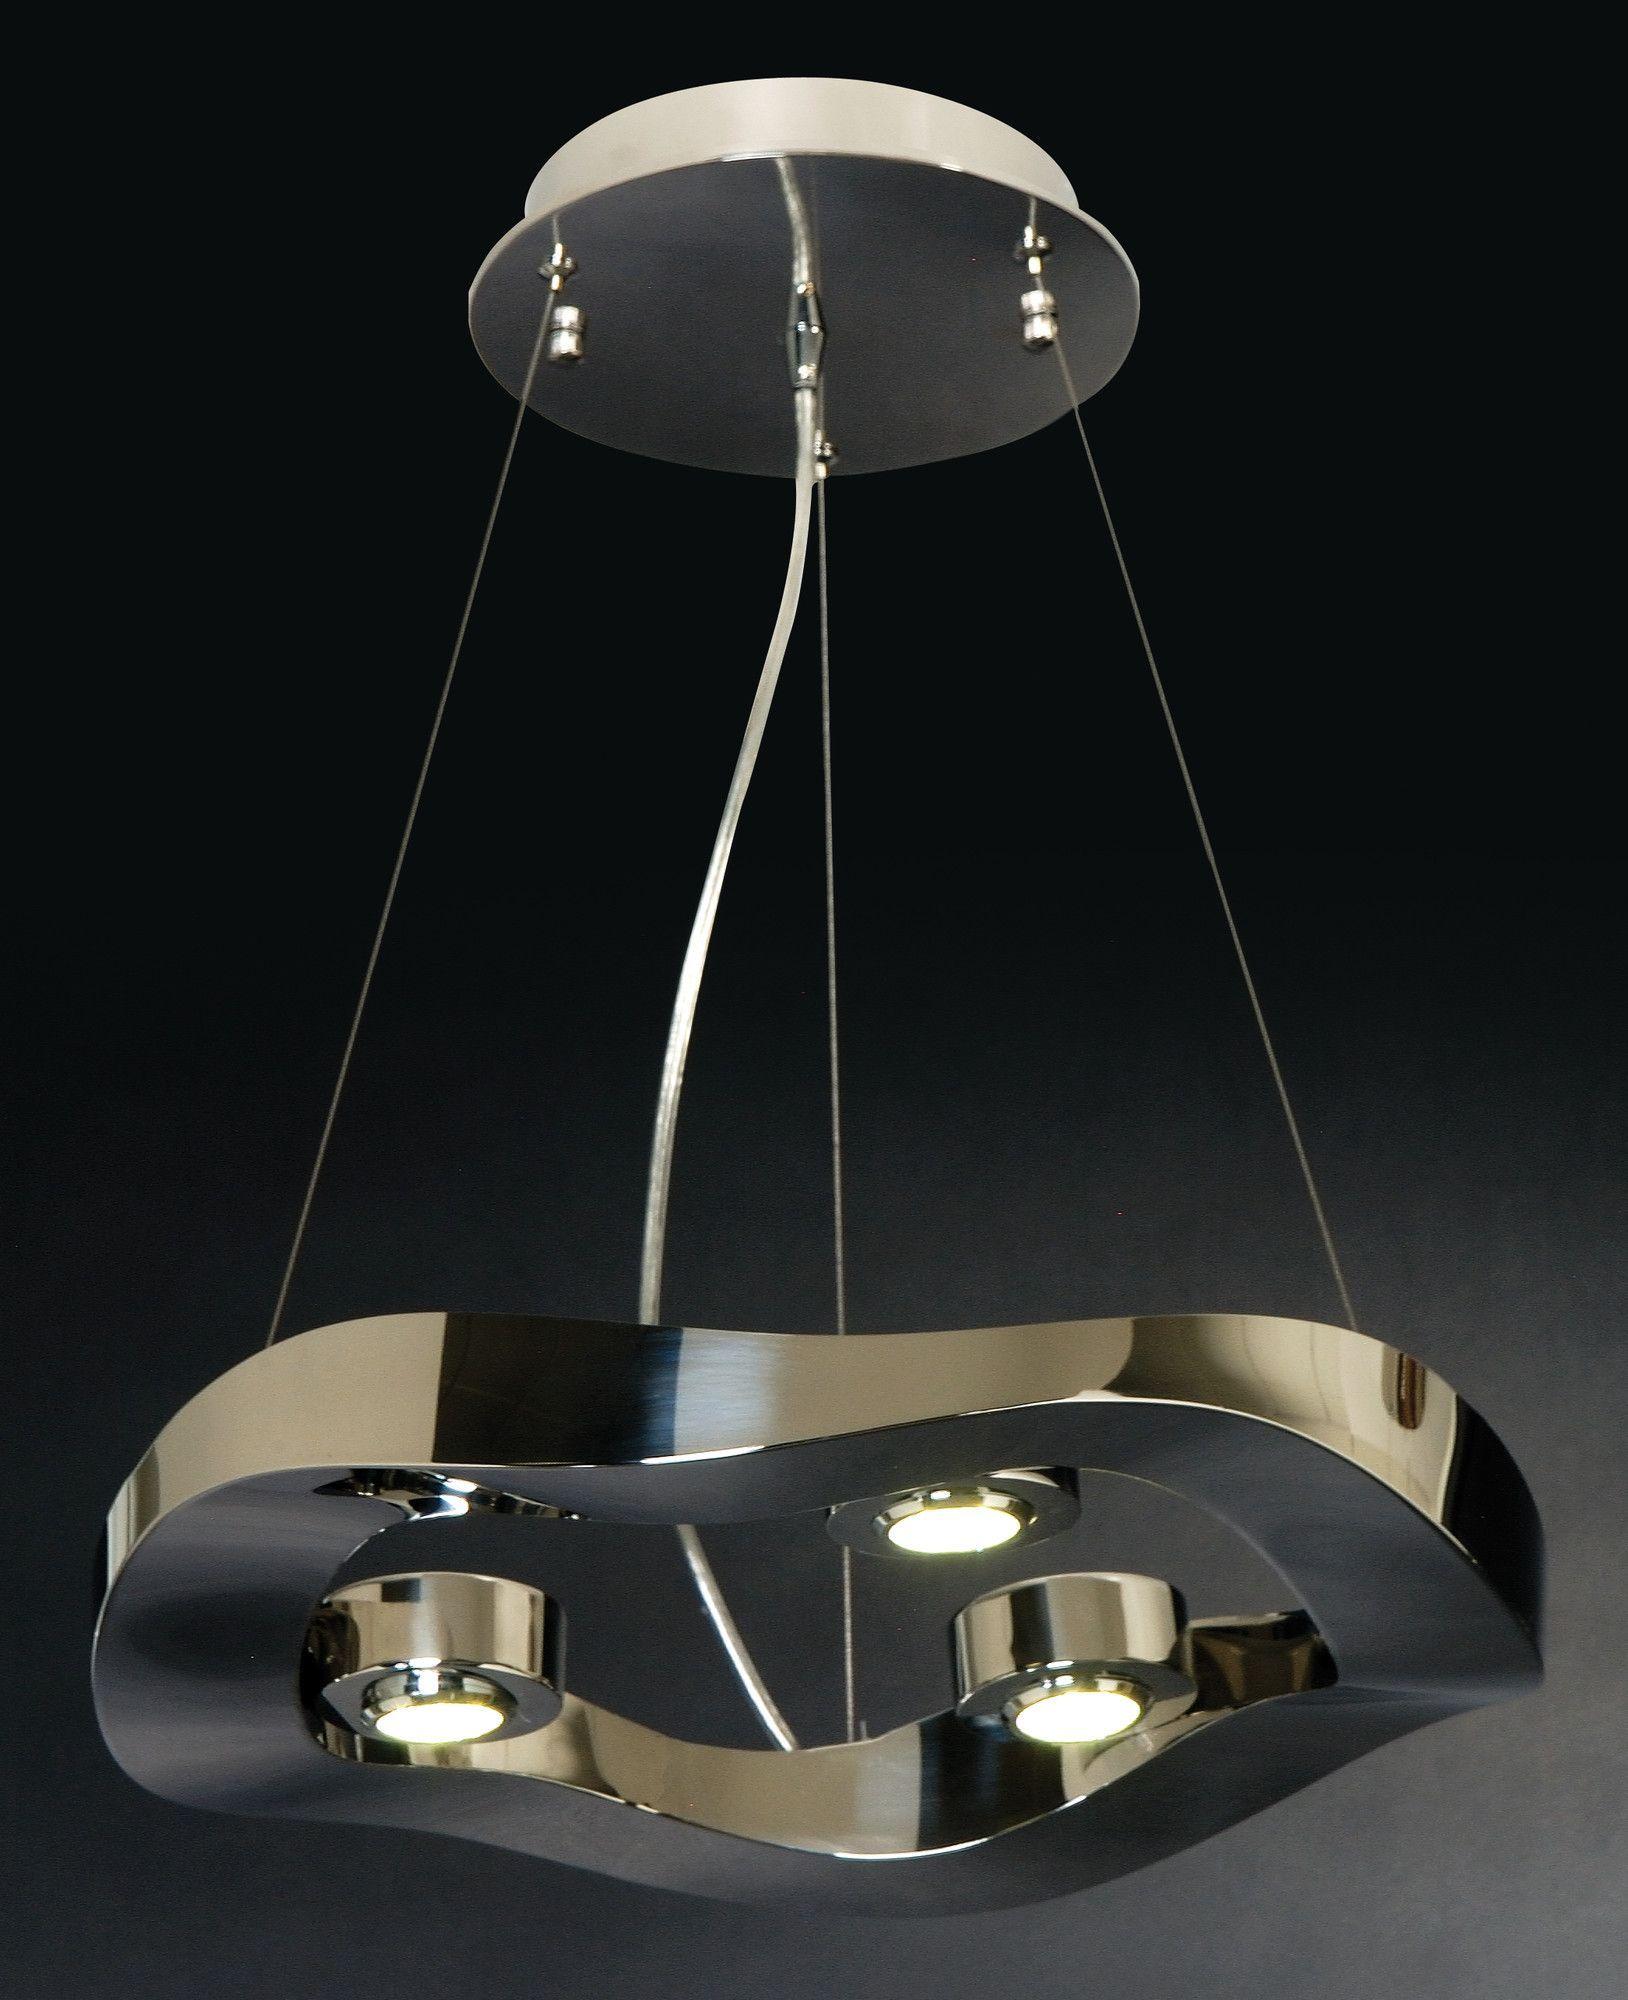 Halo light kitchen island pendant lighting pinterest island